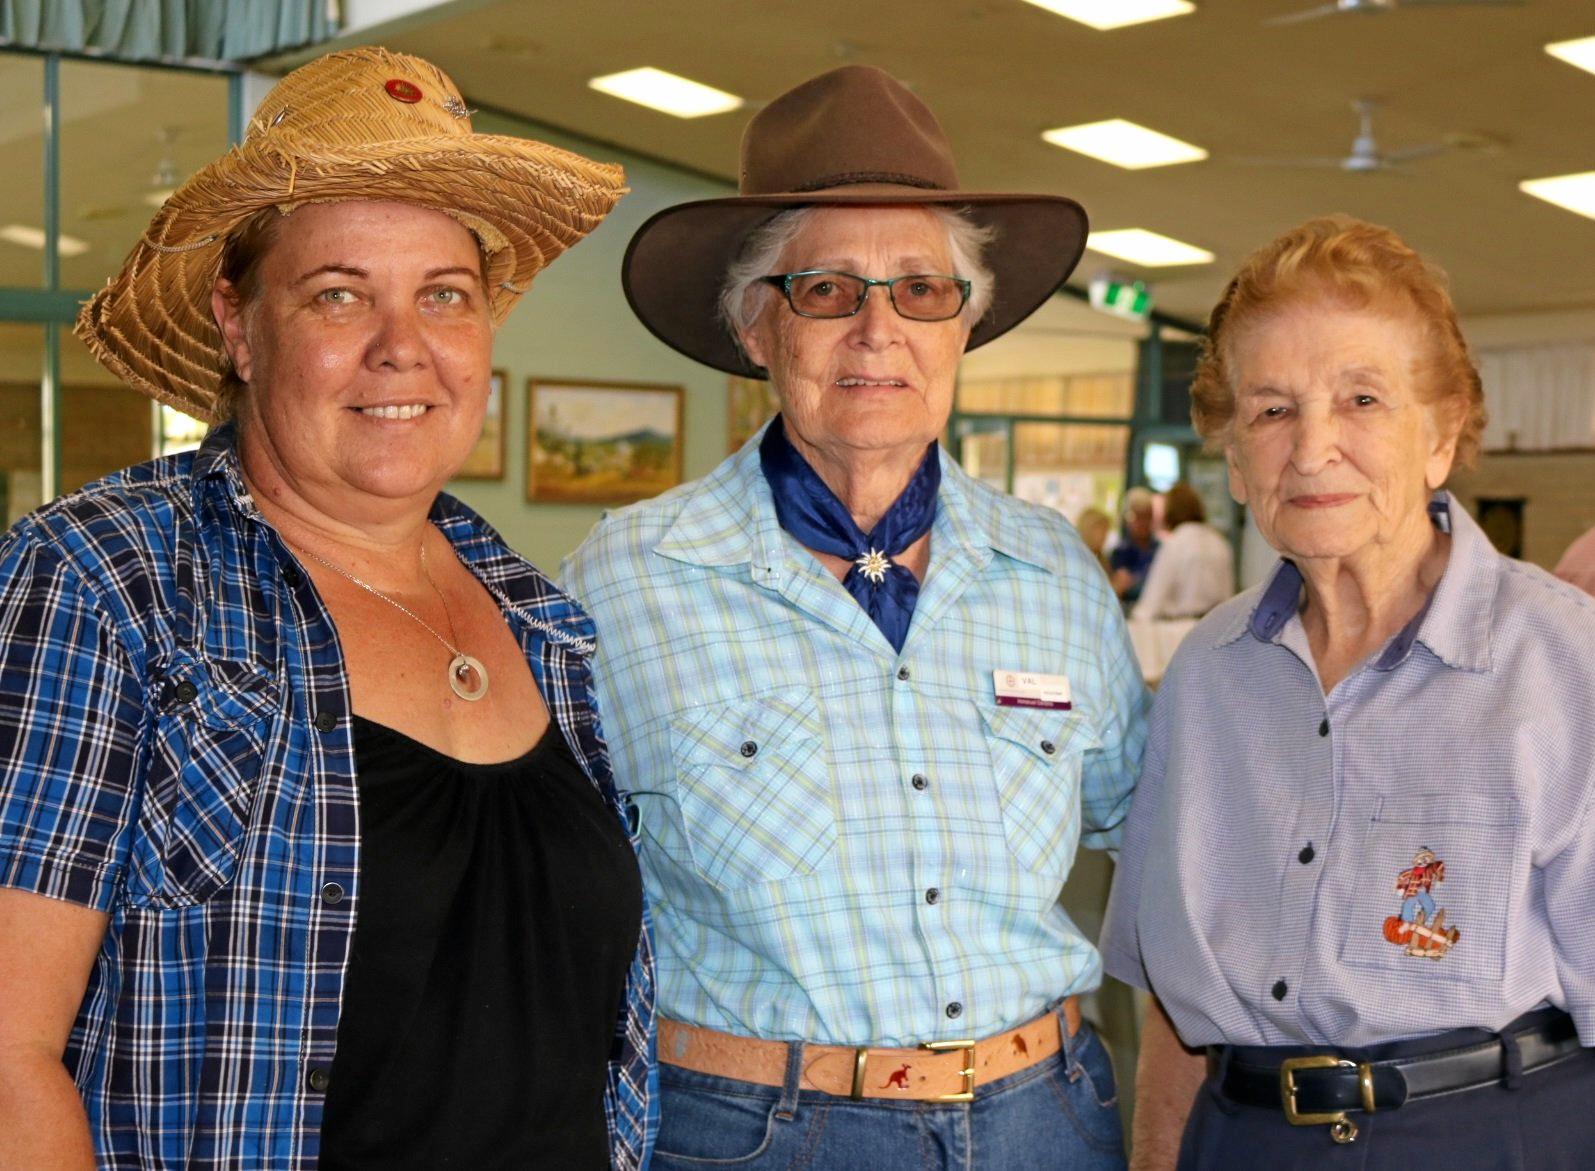 Karen Hawkins, Val Brand and Elaine Wishart.